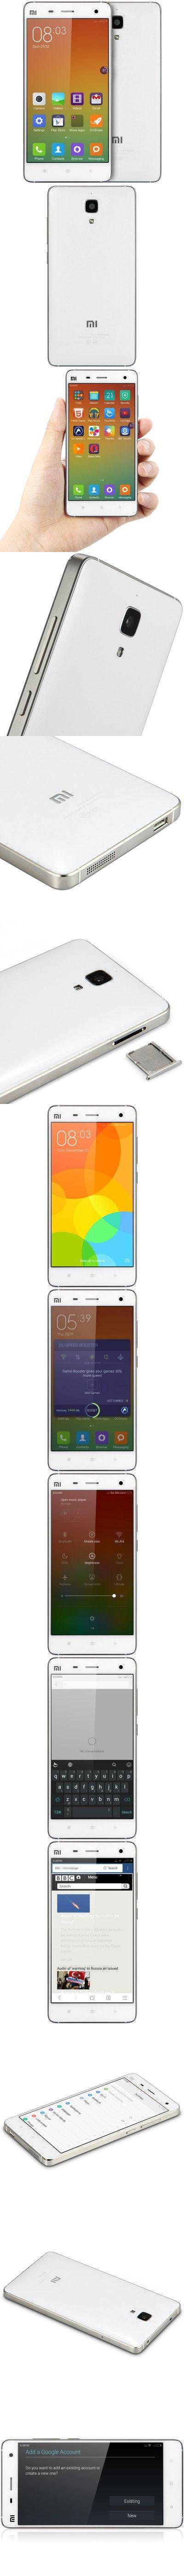 XIAOMI MI4 Unlocked Smartphone